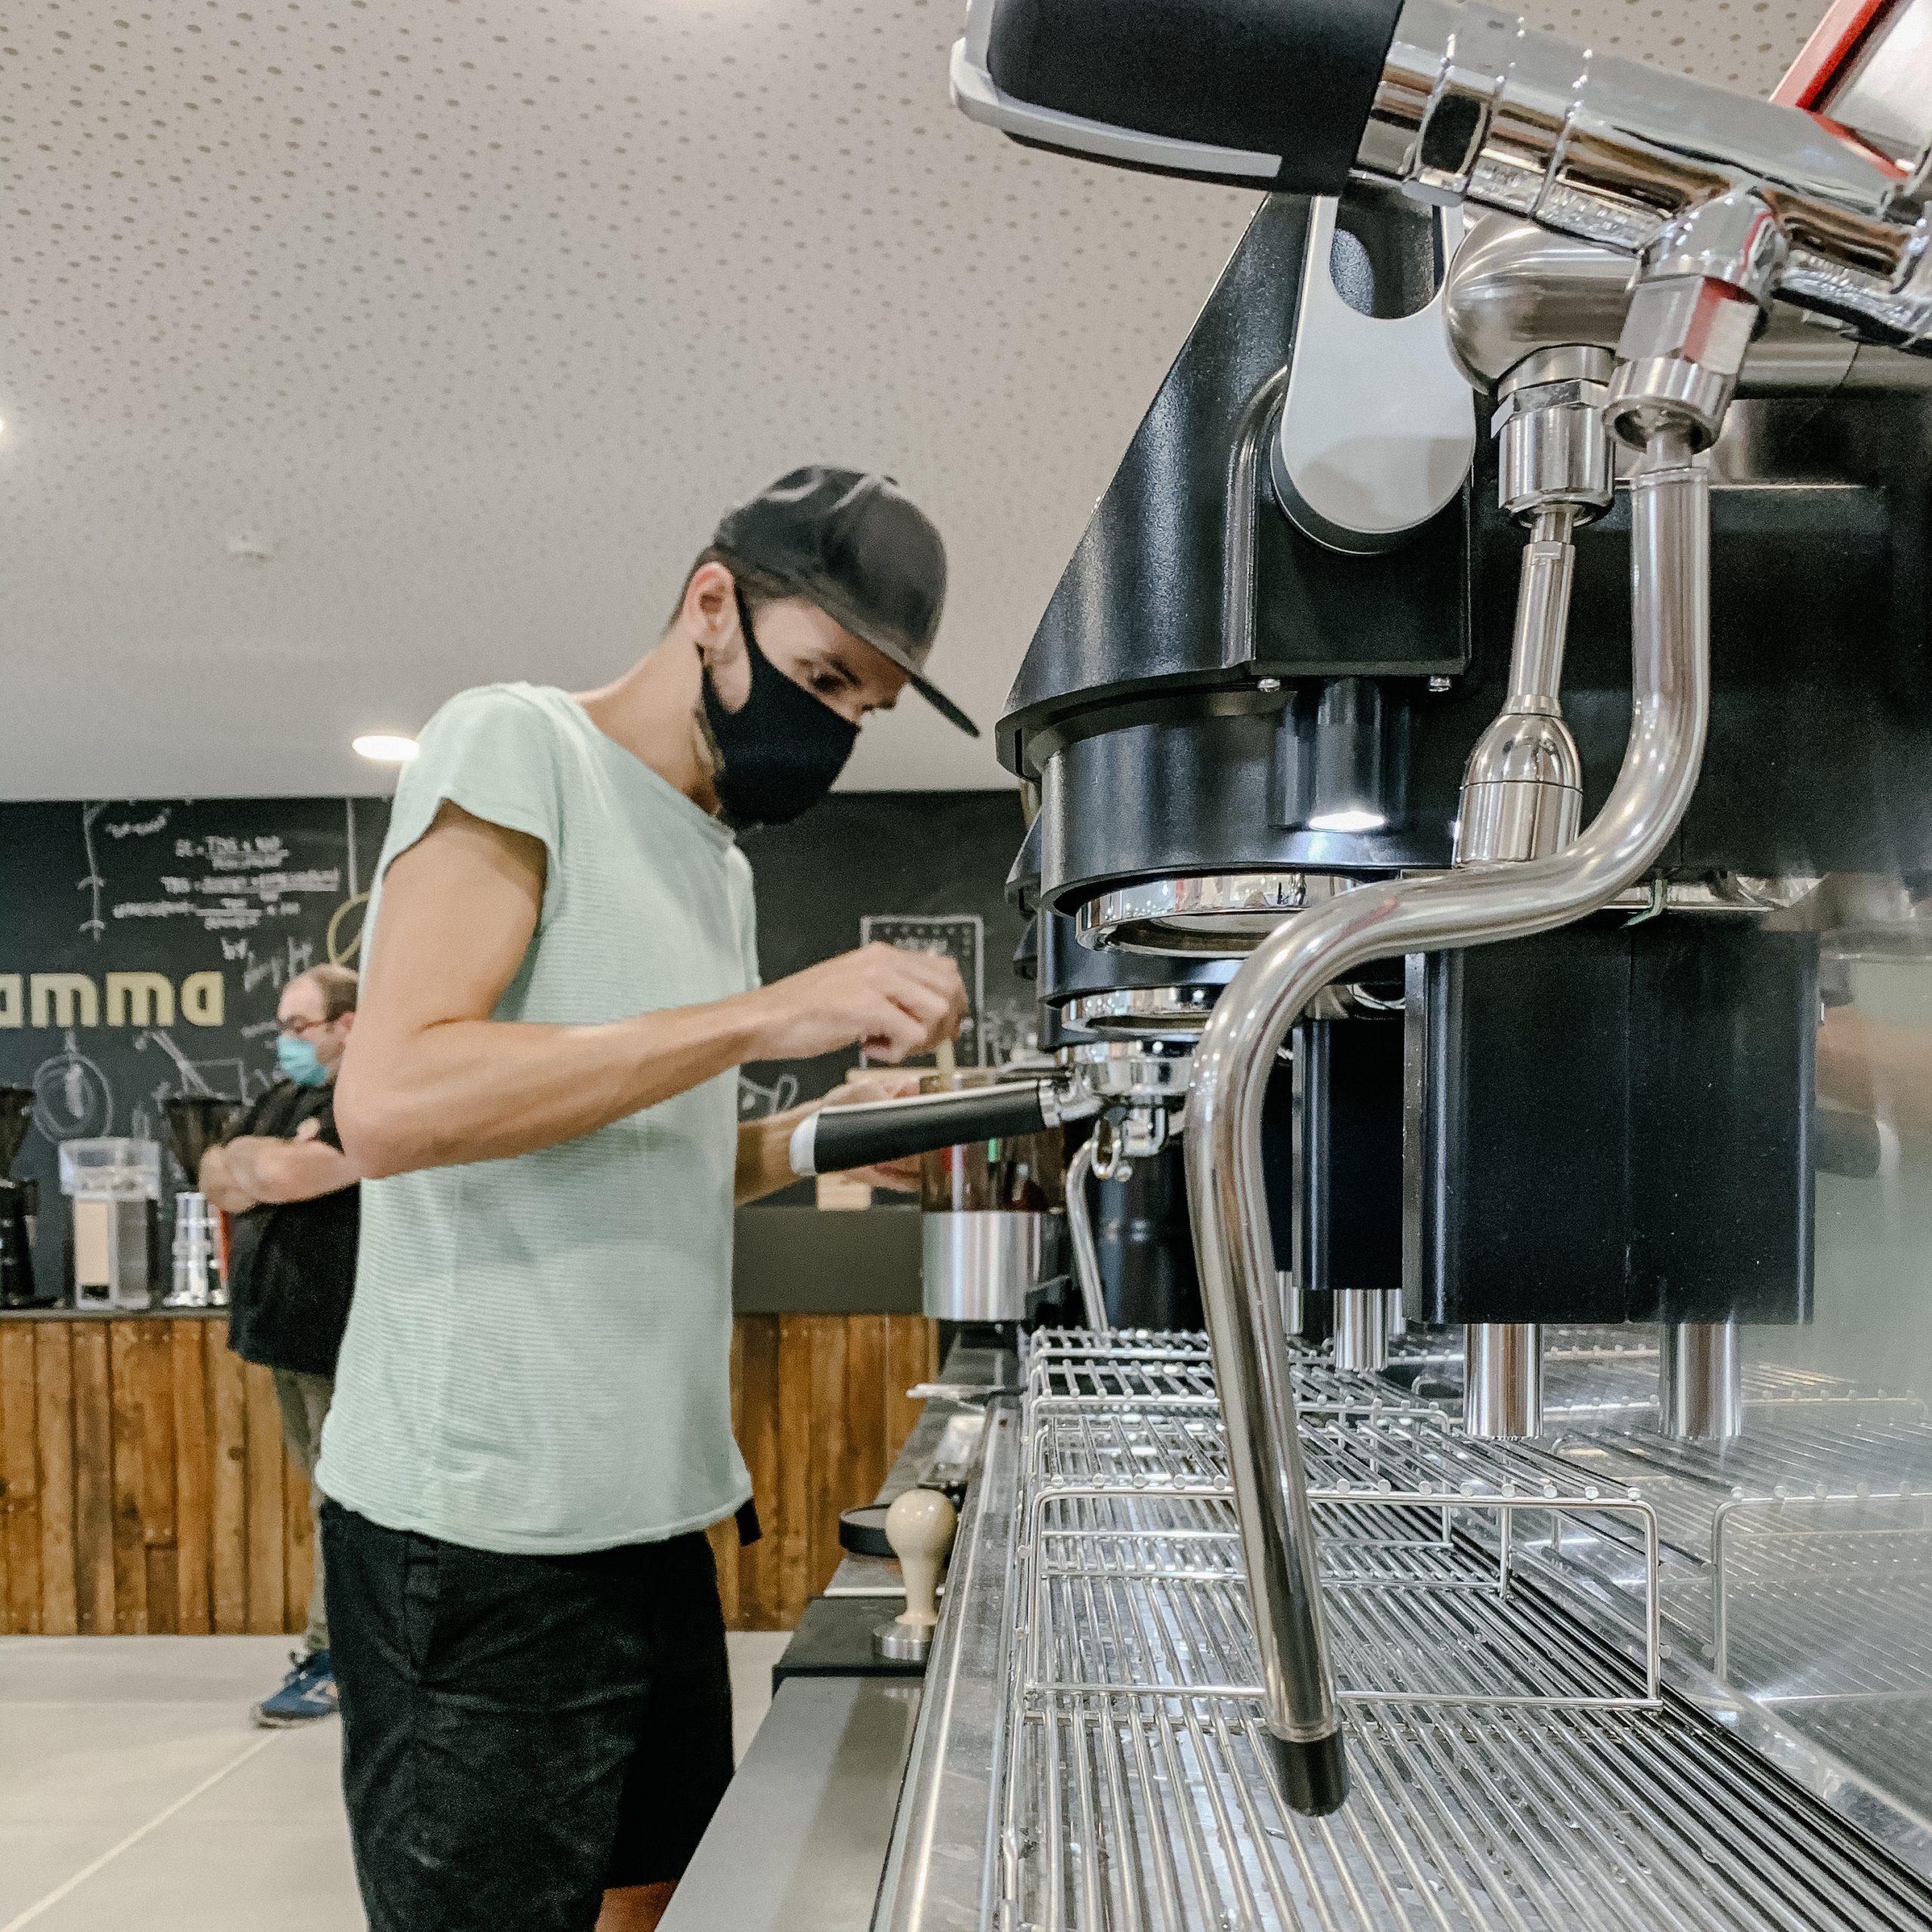 Work with an espresso machine